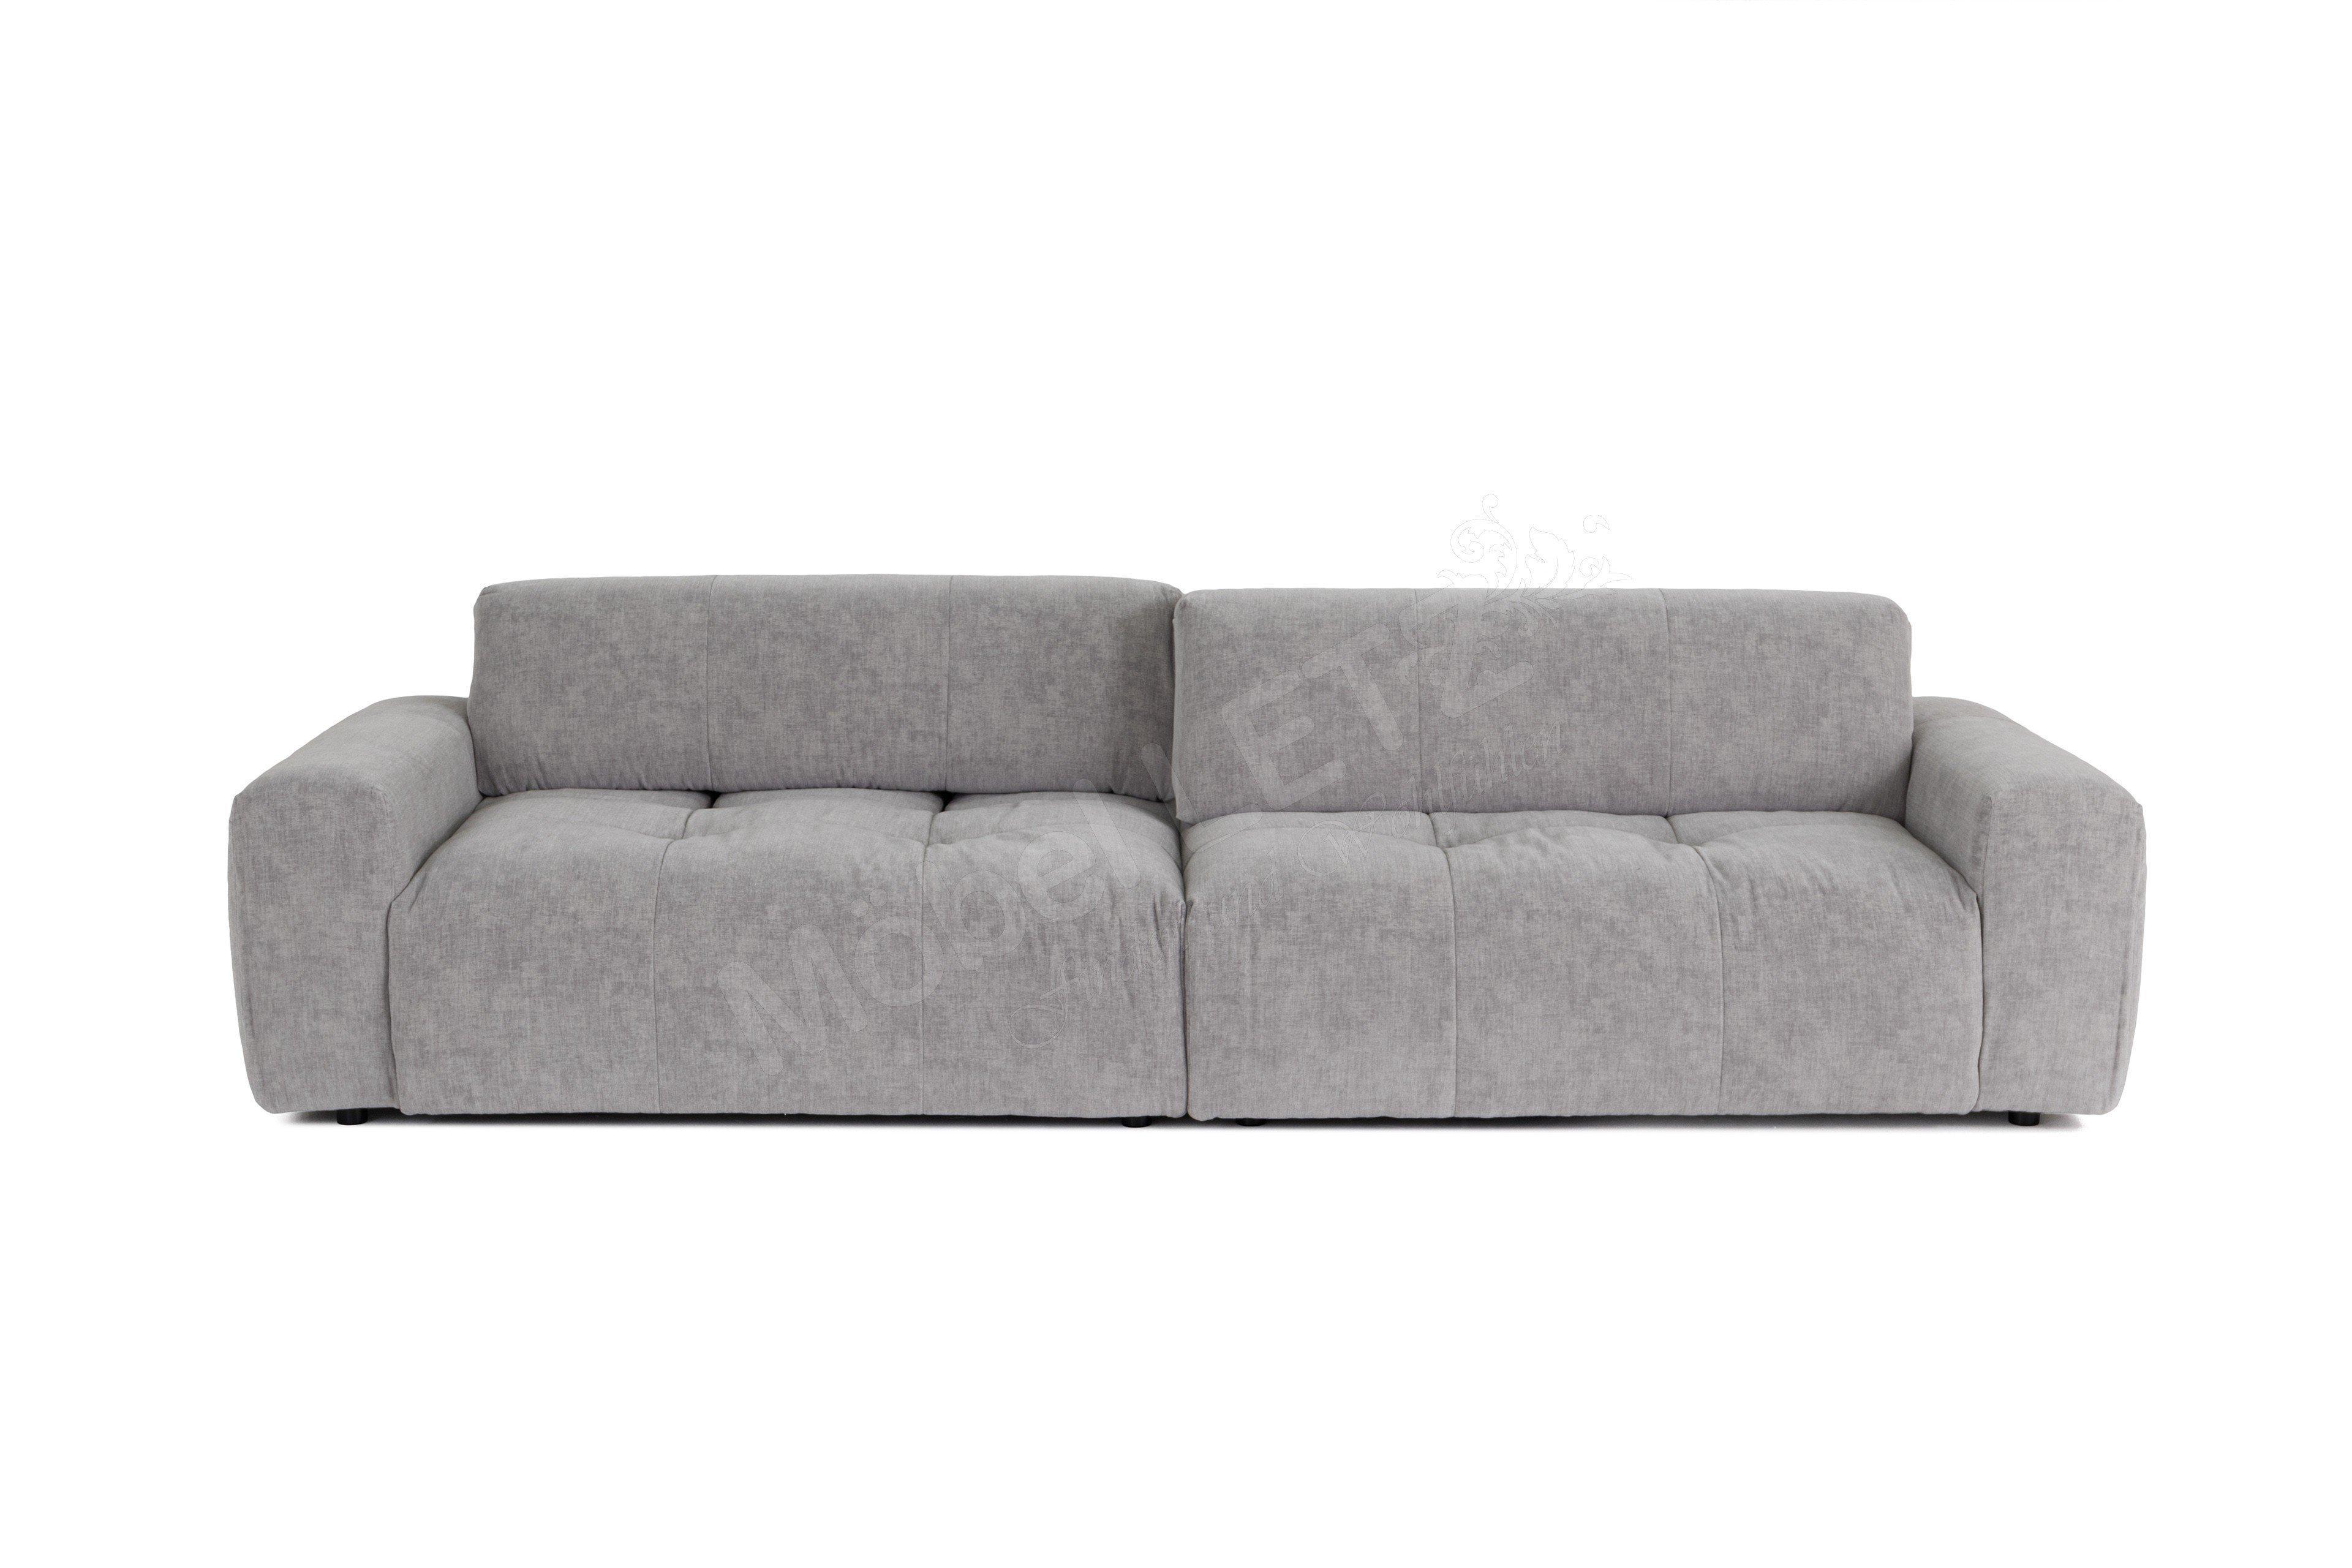 candy place xxl sofa hellgrau m bel letz ihr online shop. Black Bedroom Furniture Sets. Home Design Ideas